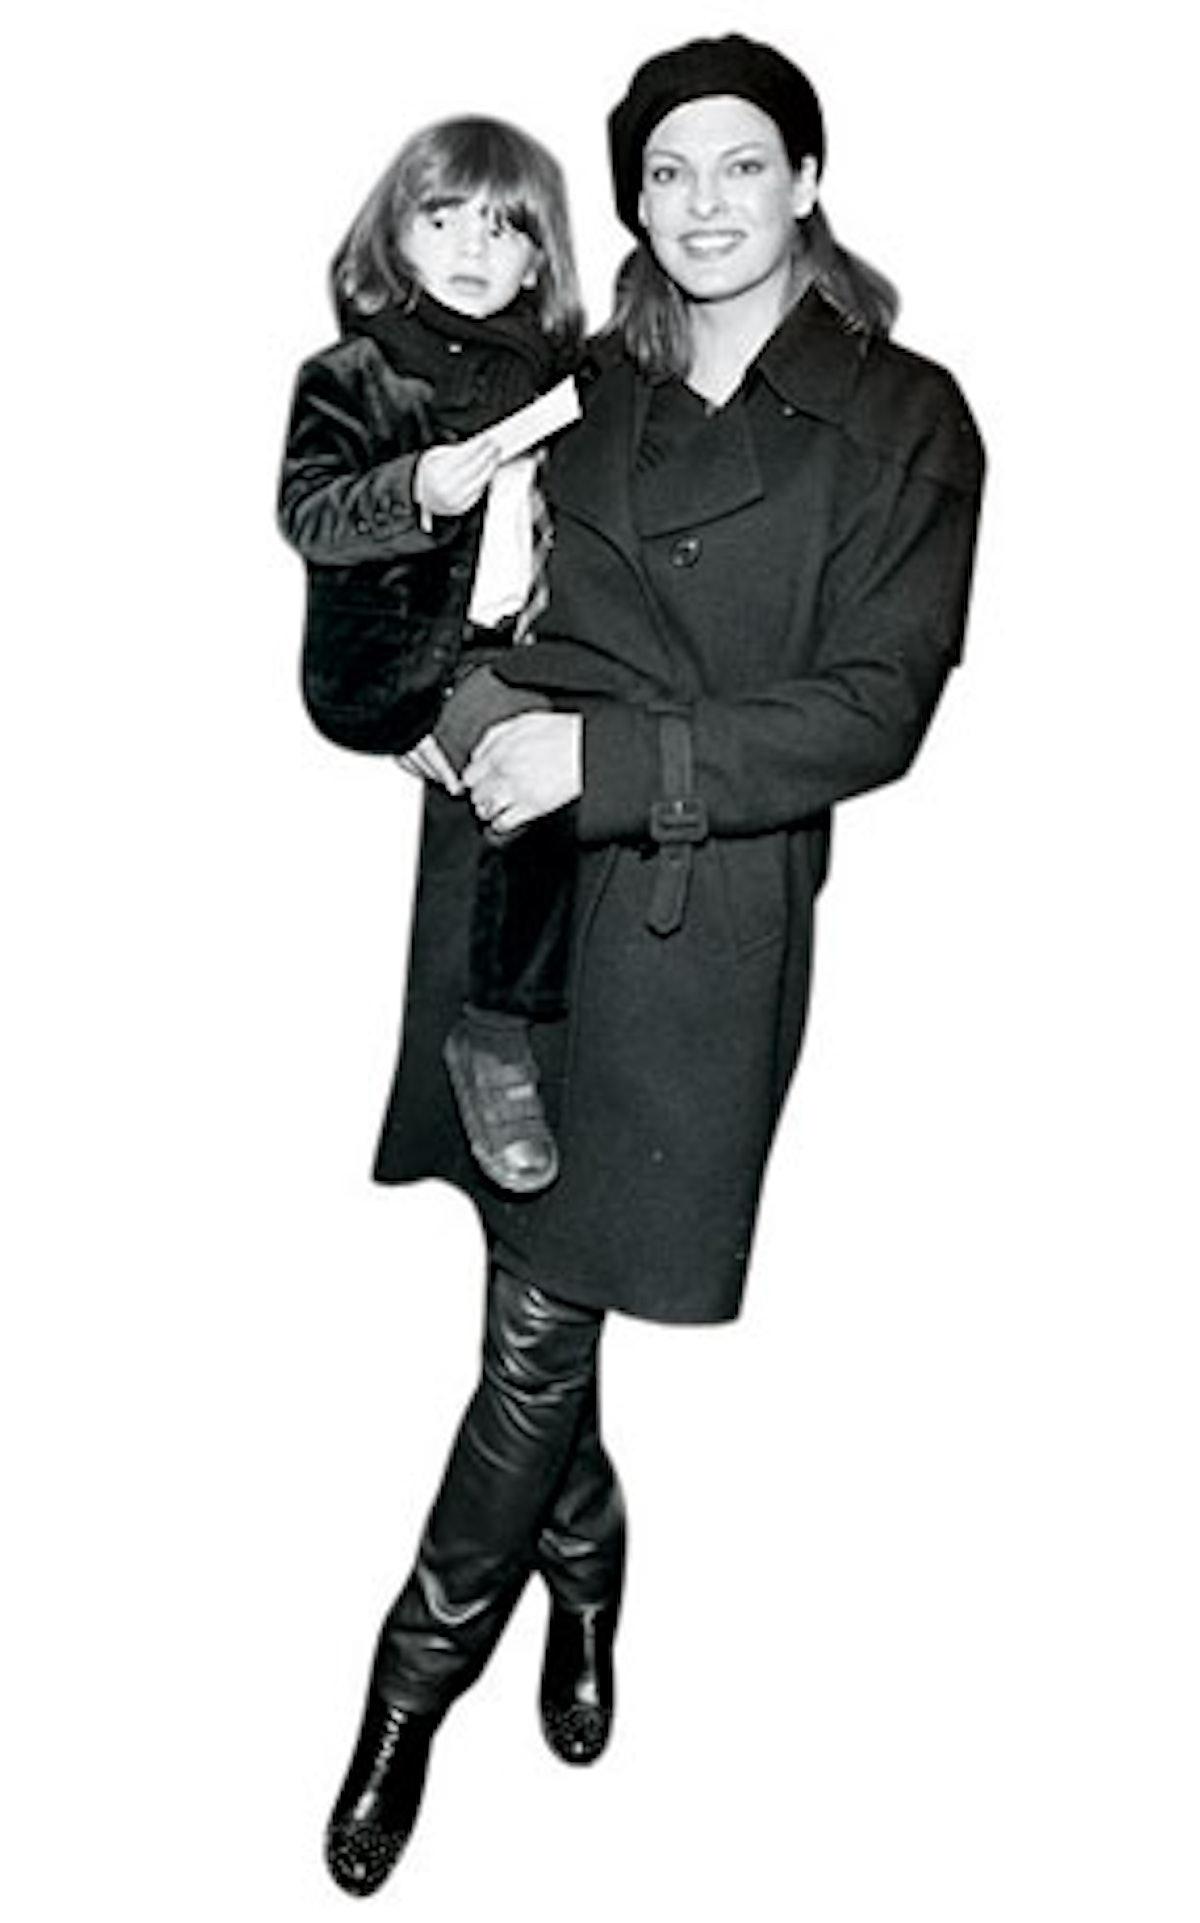 faar-fashion-scandals-40-years-08.jpg